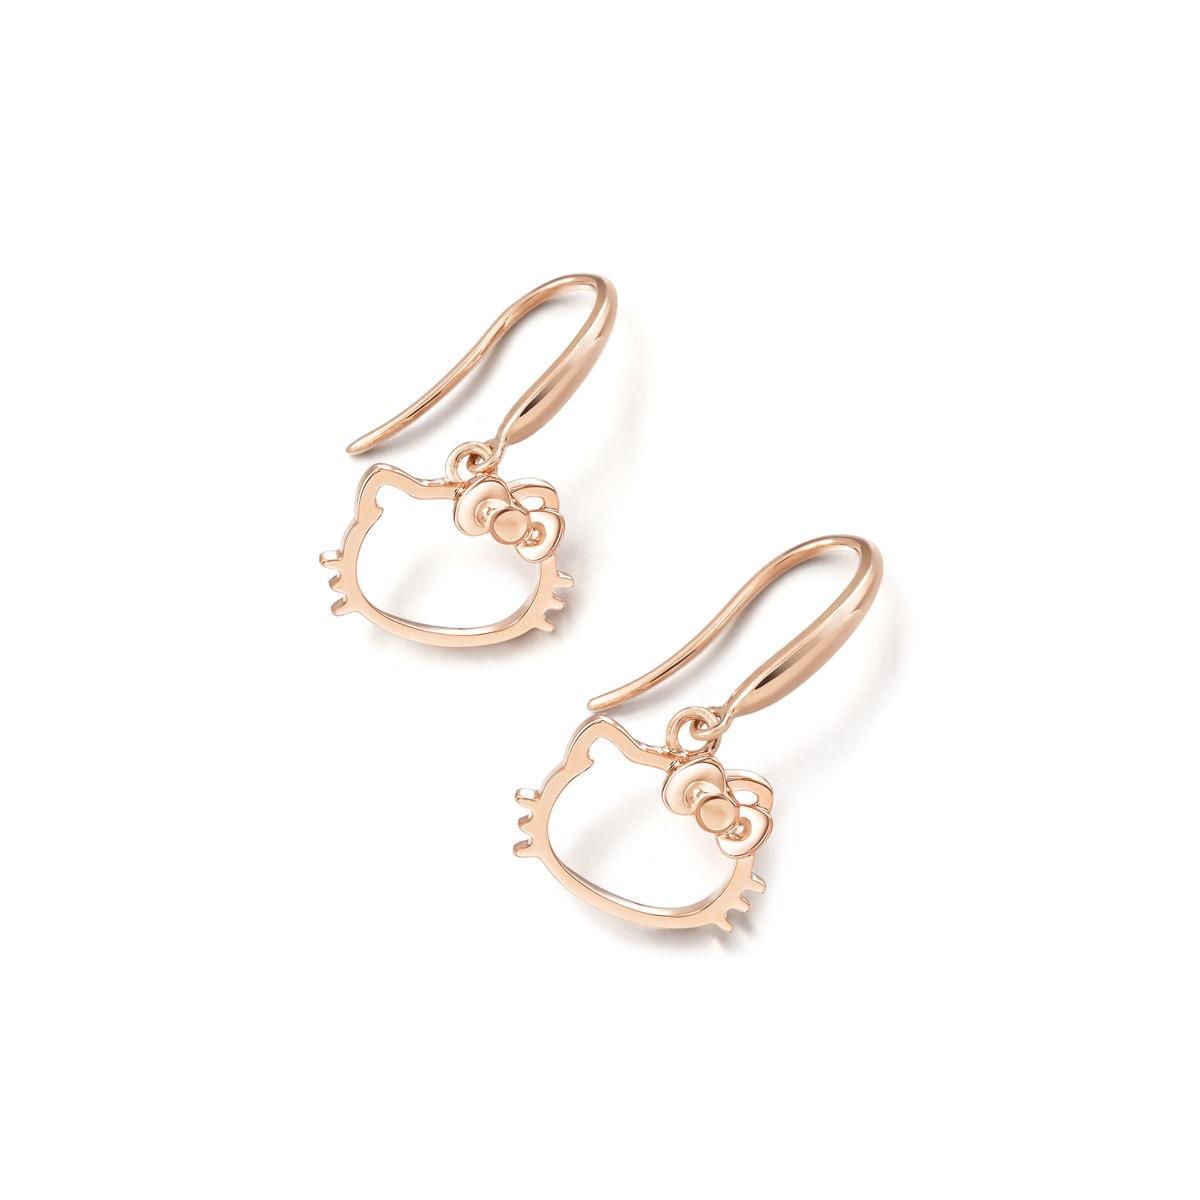 Sanrio \'Hello Kitty\' 18K Gold Earrings | Chow Sang Sang Jewellery ...